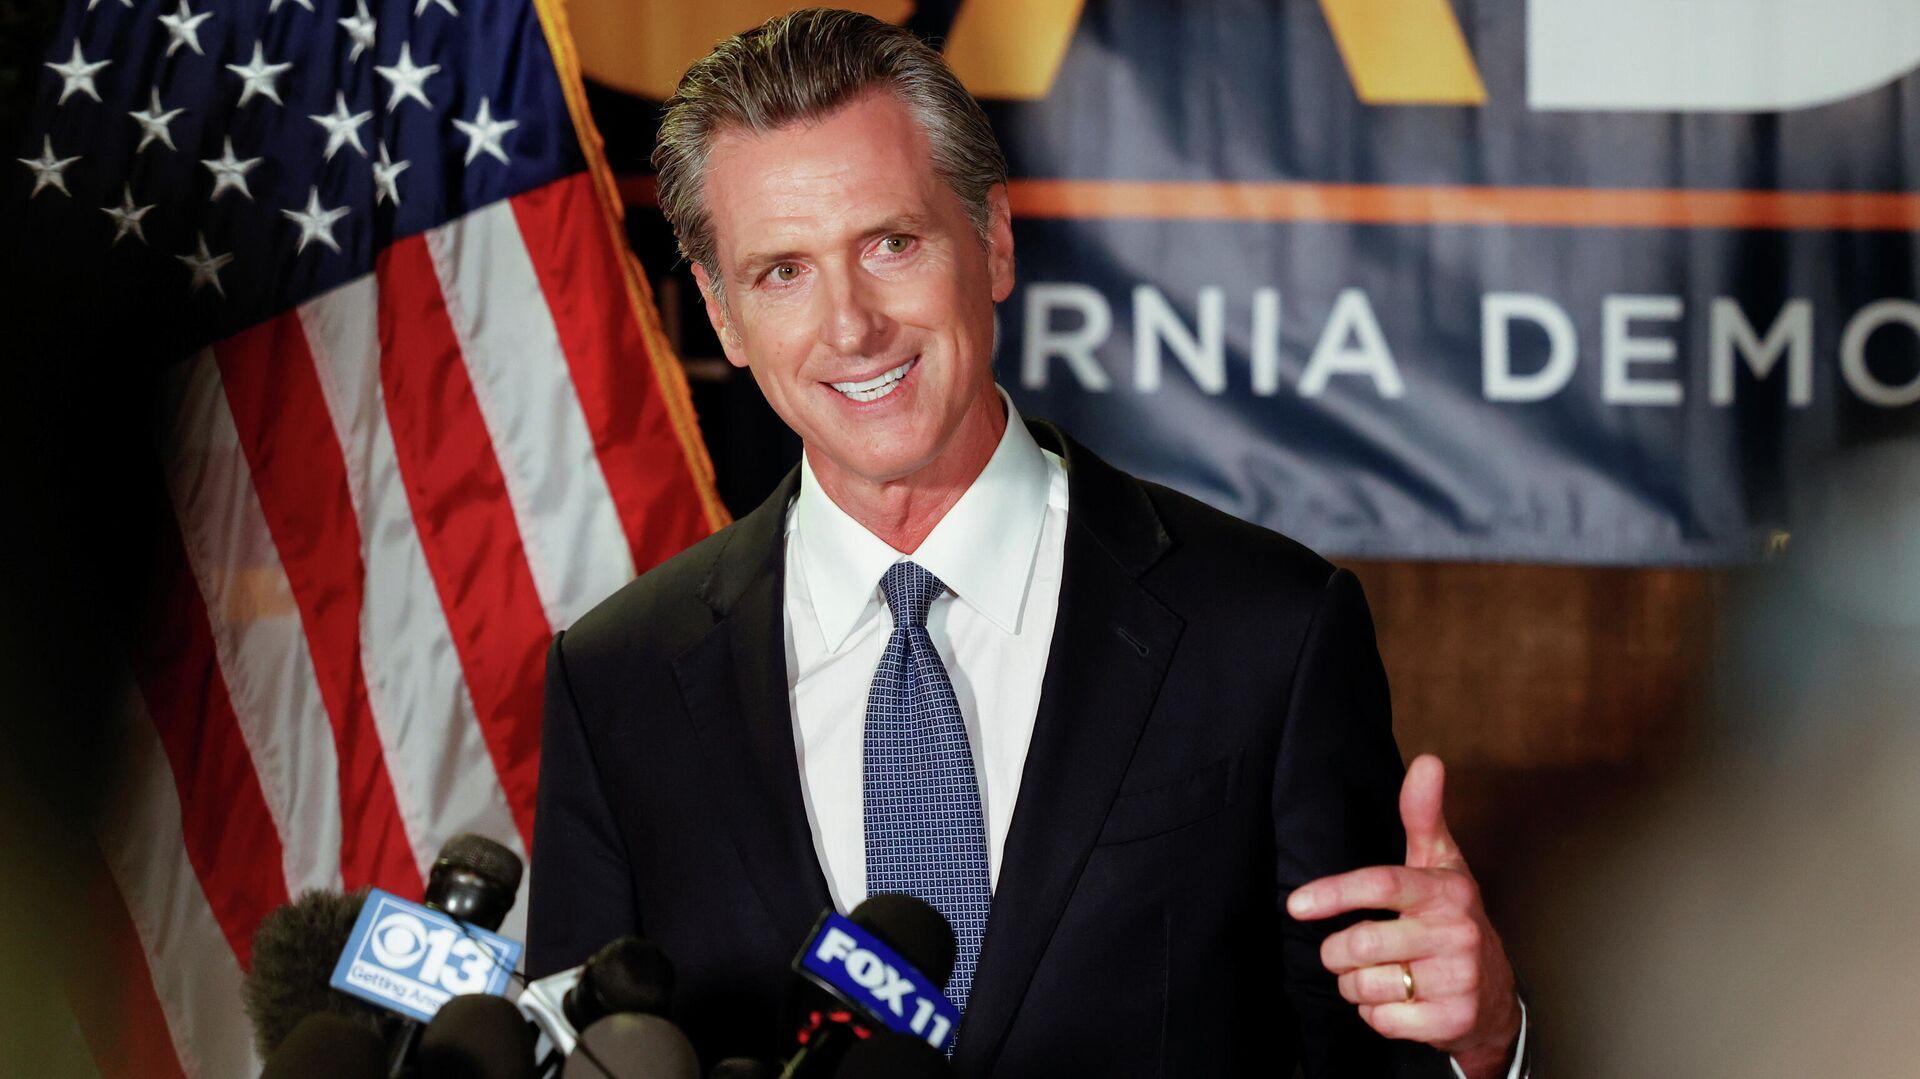 California Governor Gavin Newsom speaks after the polls close on the recall election, at the California Democratic Party headquarters in Sacramento, California, U.S., September 14, 2021 - Sputnik International, 1920, 15.09.2021